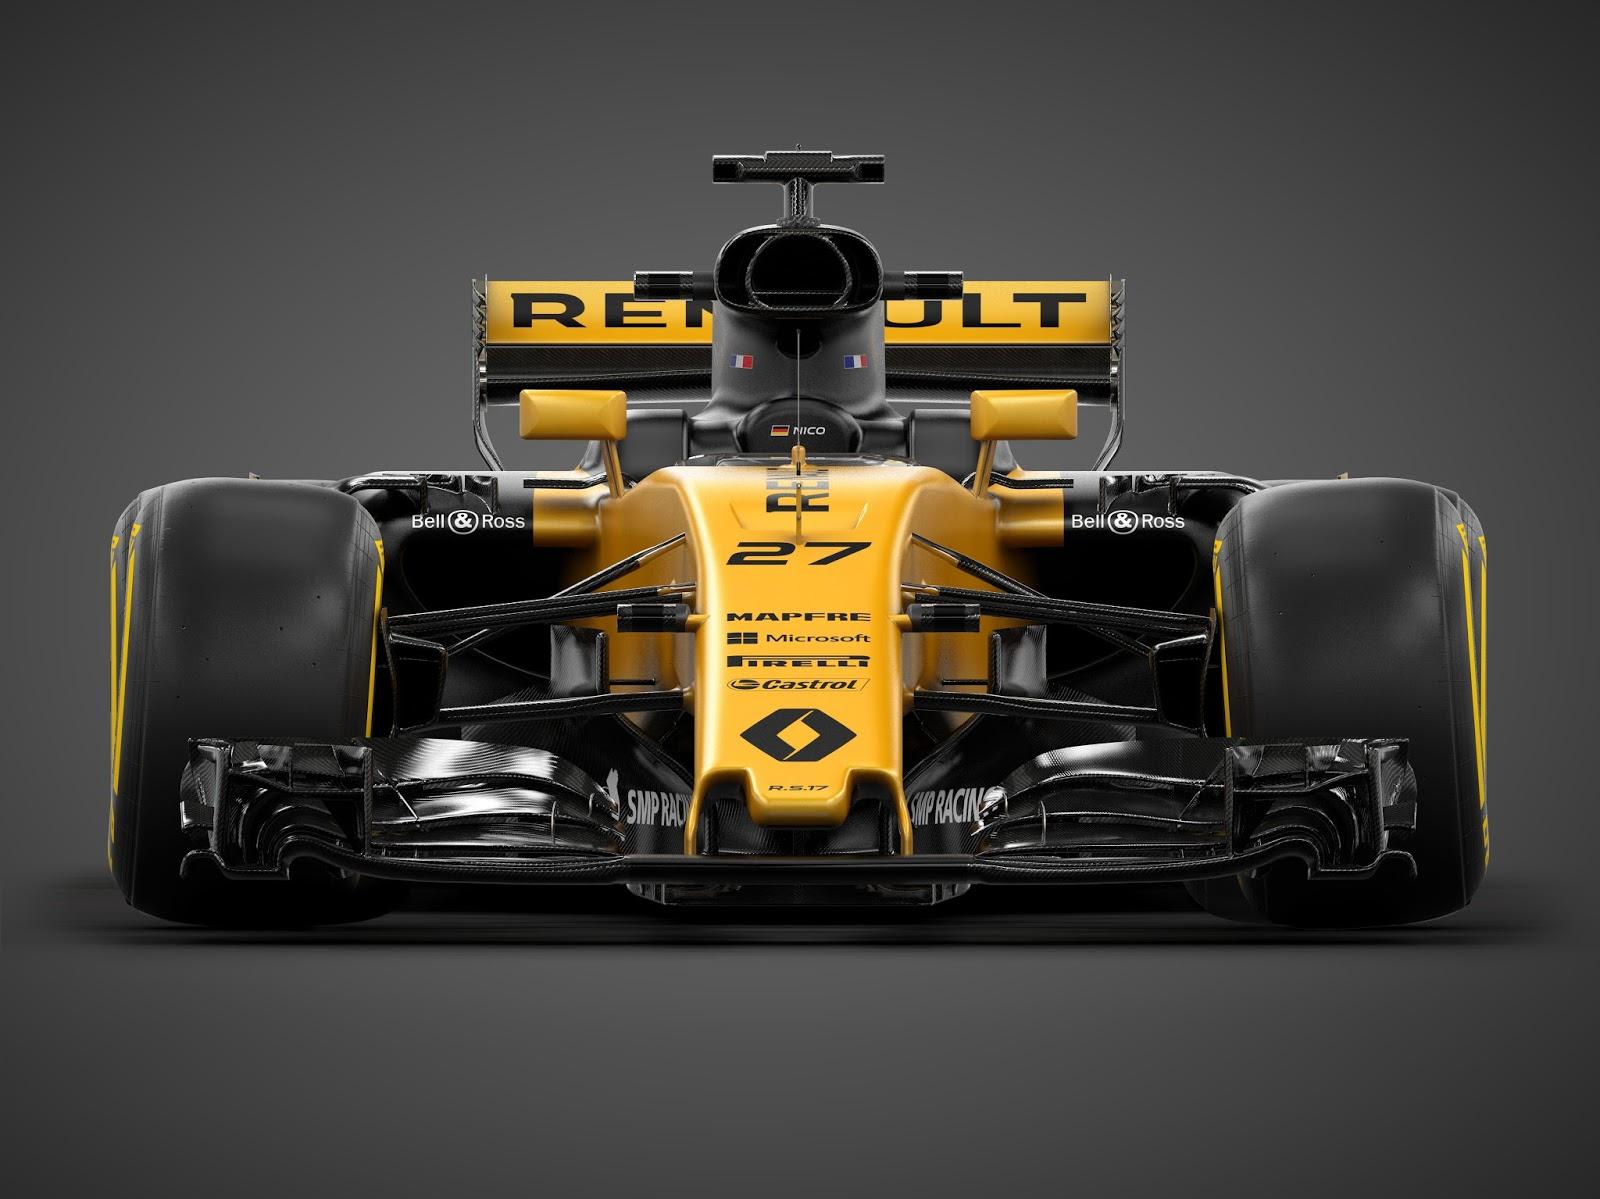 A3 RS17 Front dark studio 1 Η Renault Sport παρουσίασε το καινούργιο της μονοθέσιο, την R.S.17 F1, Formula 1, Renault, Renault Sport Formula 1 Team, videos